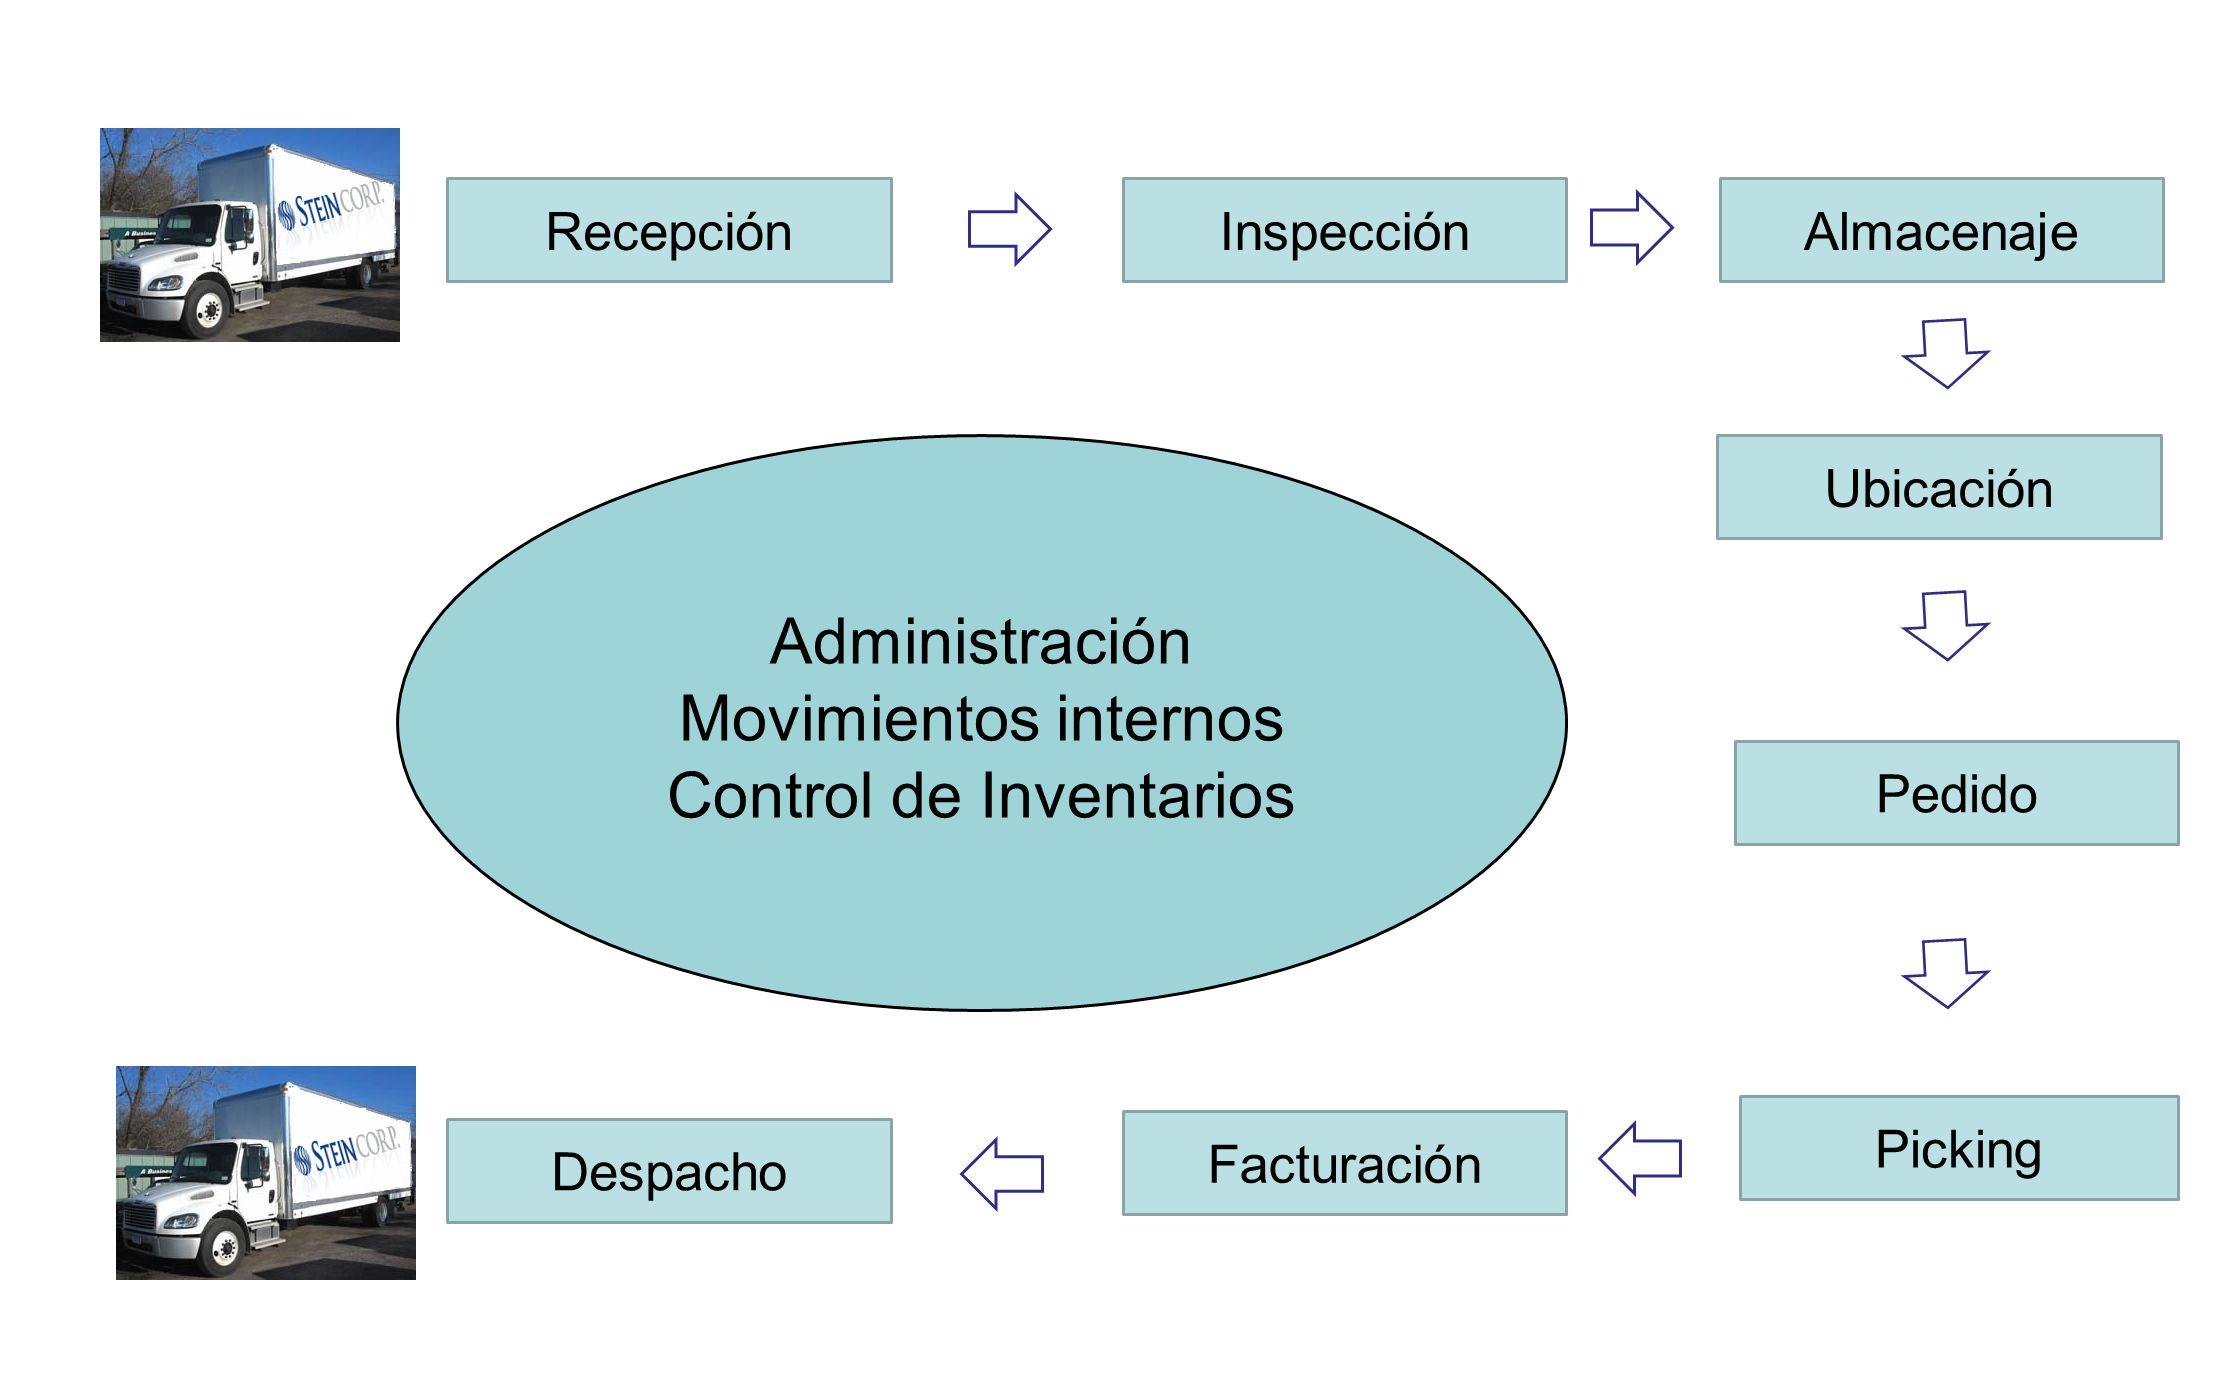 Recepción Picking InspecciónAlmacenaje Pedido Facturación Despacho Ubicación Administración Movimientos internos Control de Inventarios